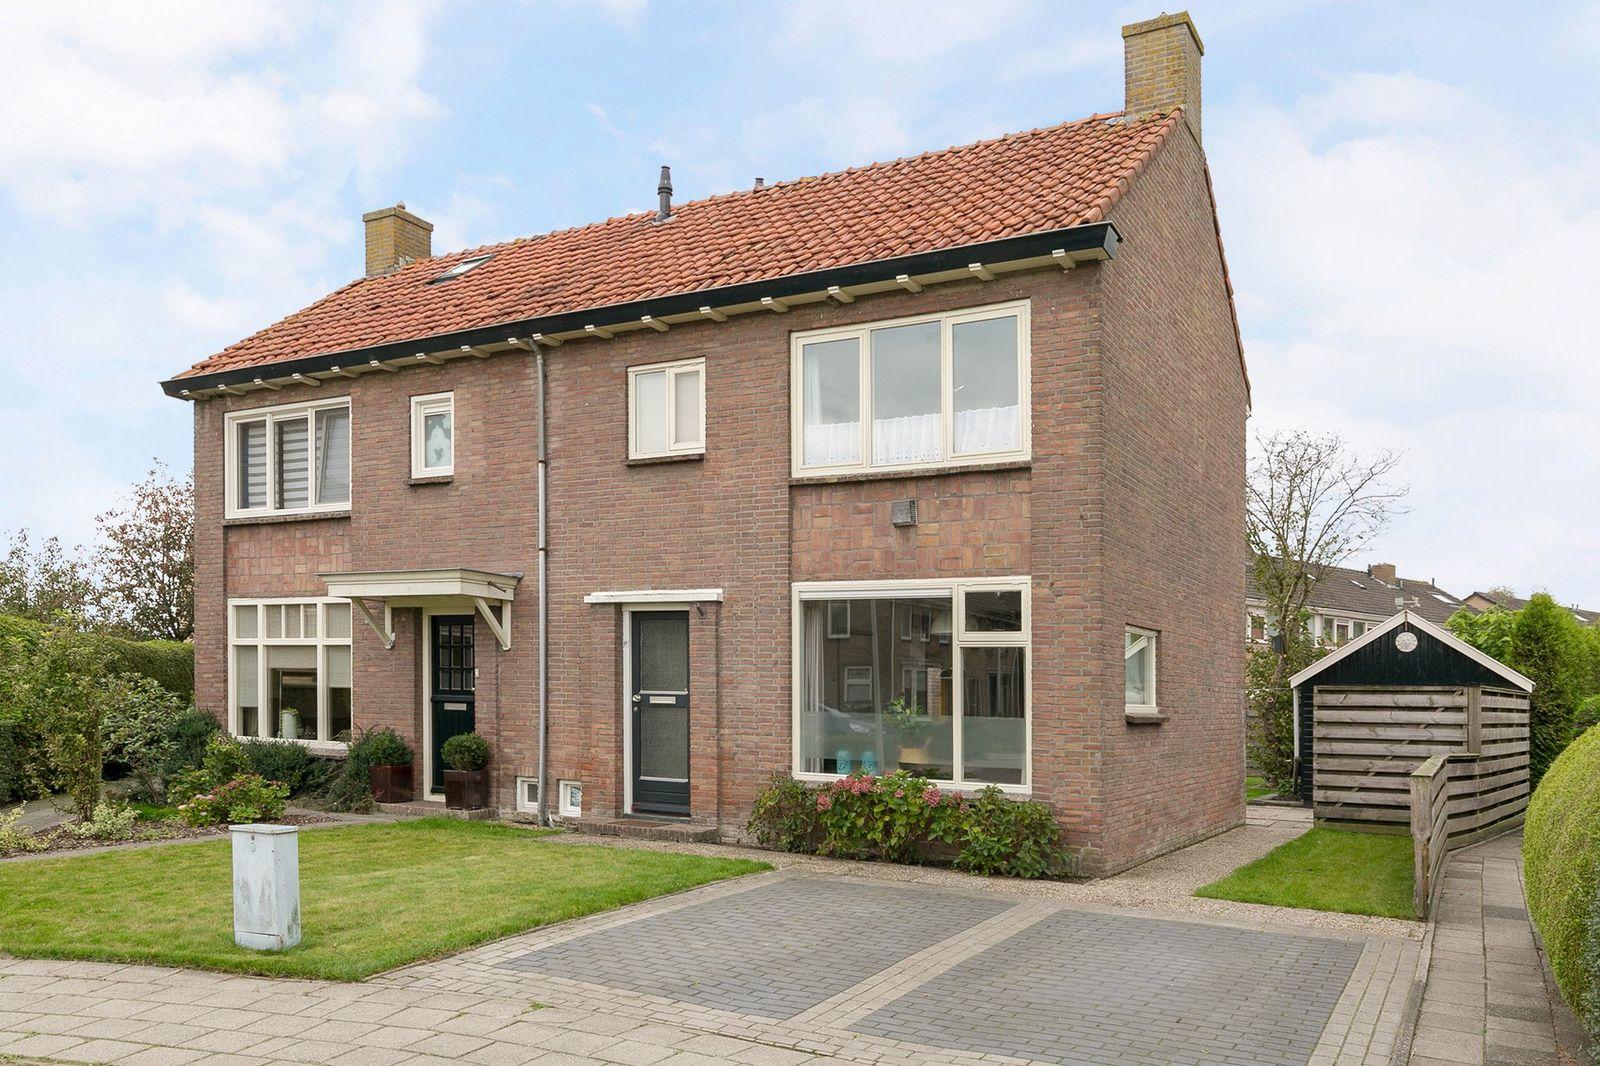 Nieuwe Leeuwarderweg 17, Wergea